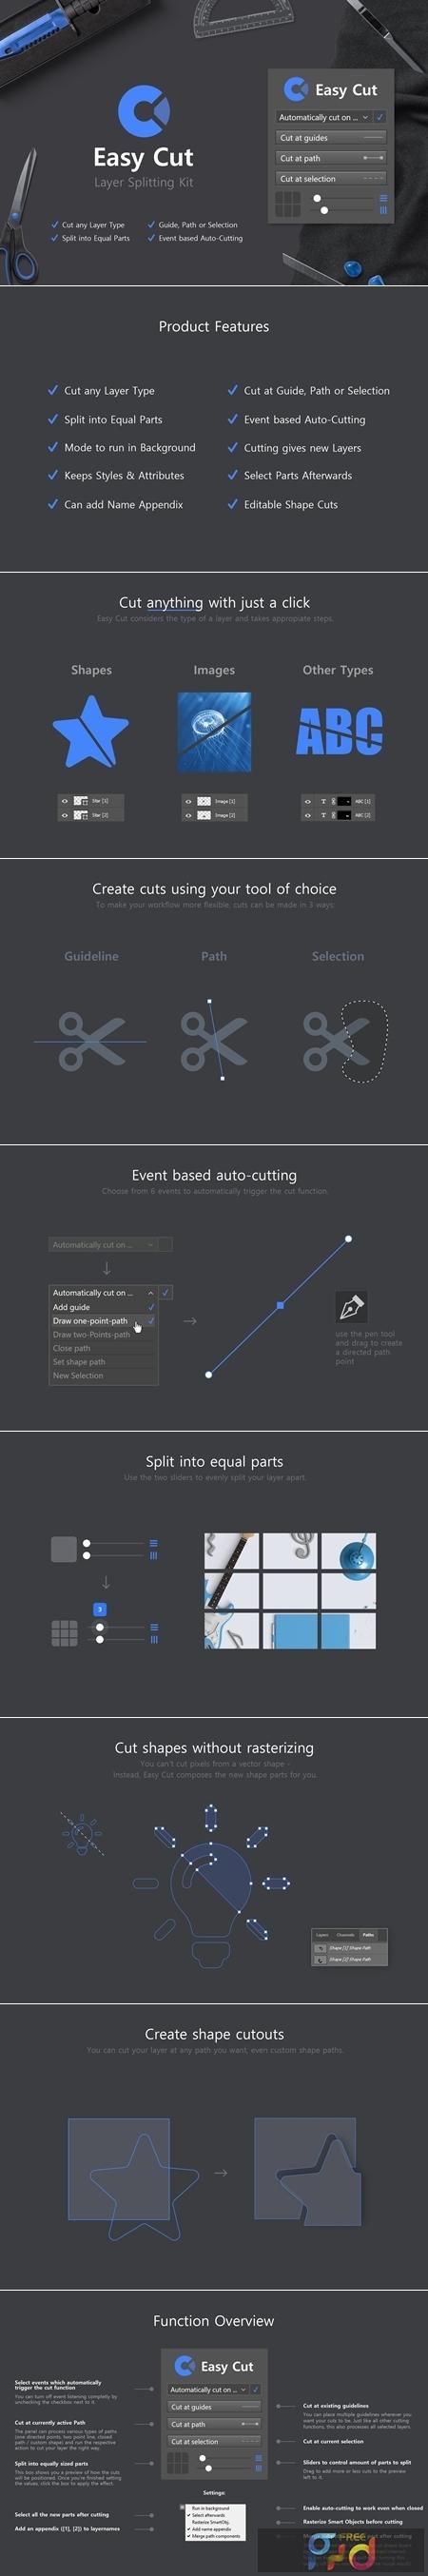 Easy Cut - Layer Splitting Kit 4277017 1